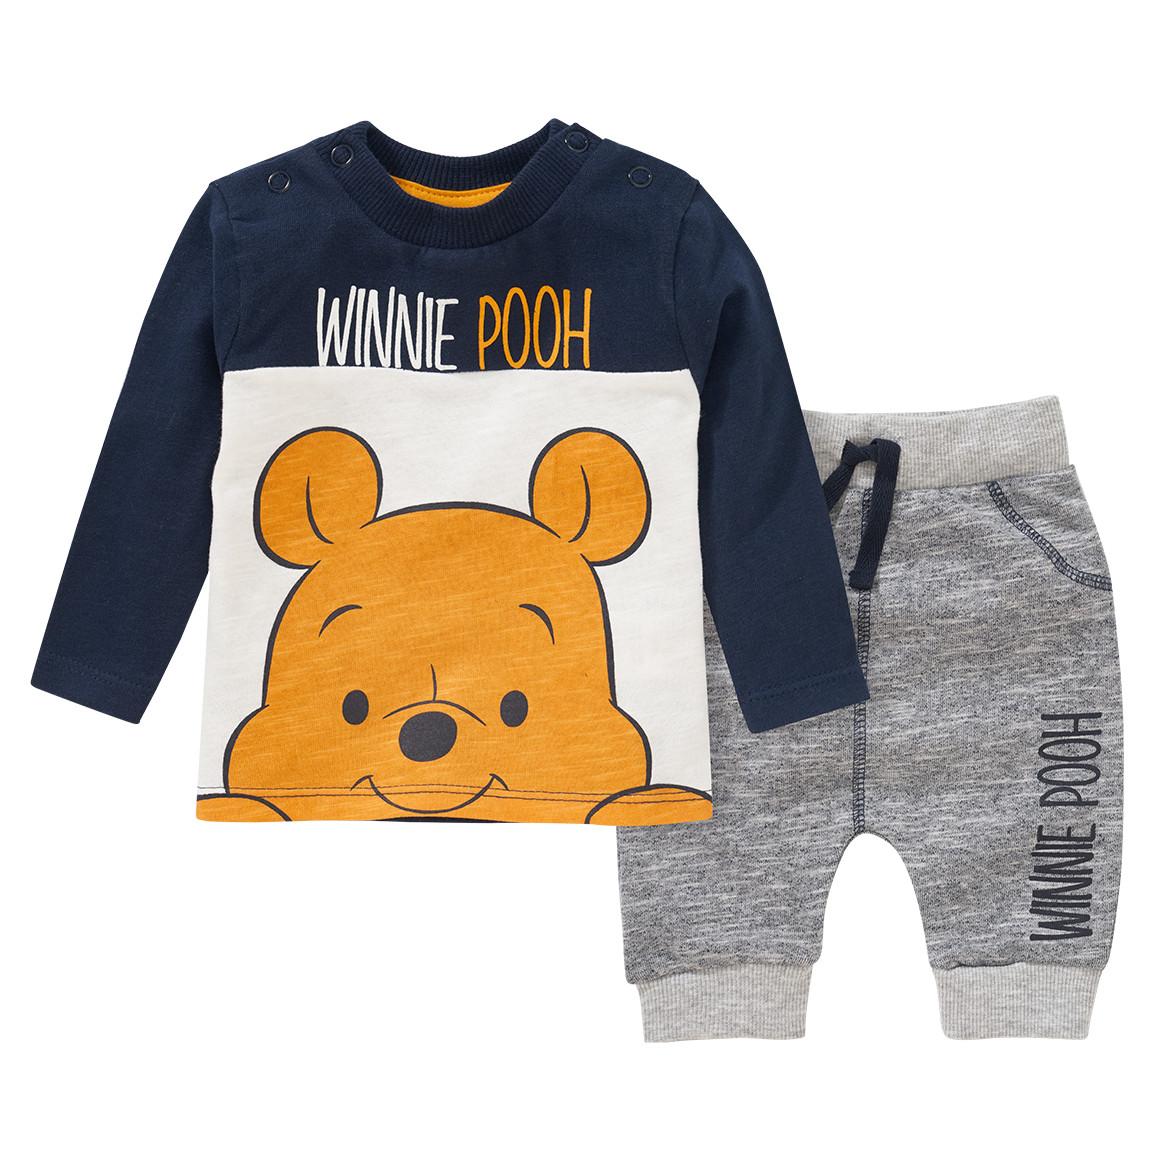 Babysets - Winnie Puuh Langarmshirt und Jogginghose - Onlineshop Ernstings family